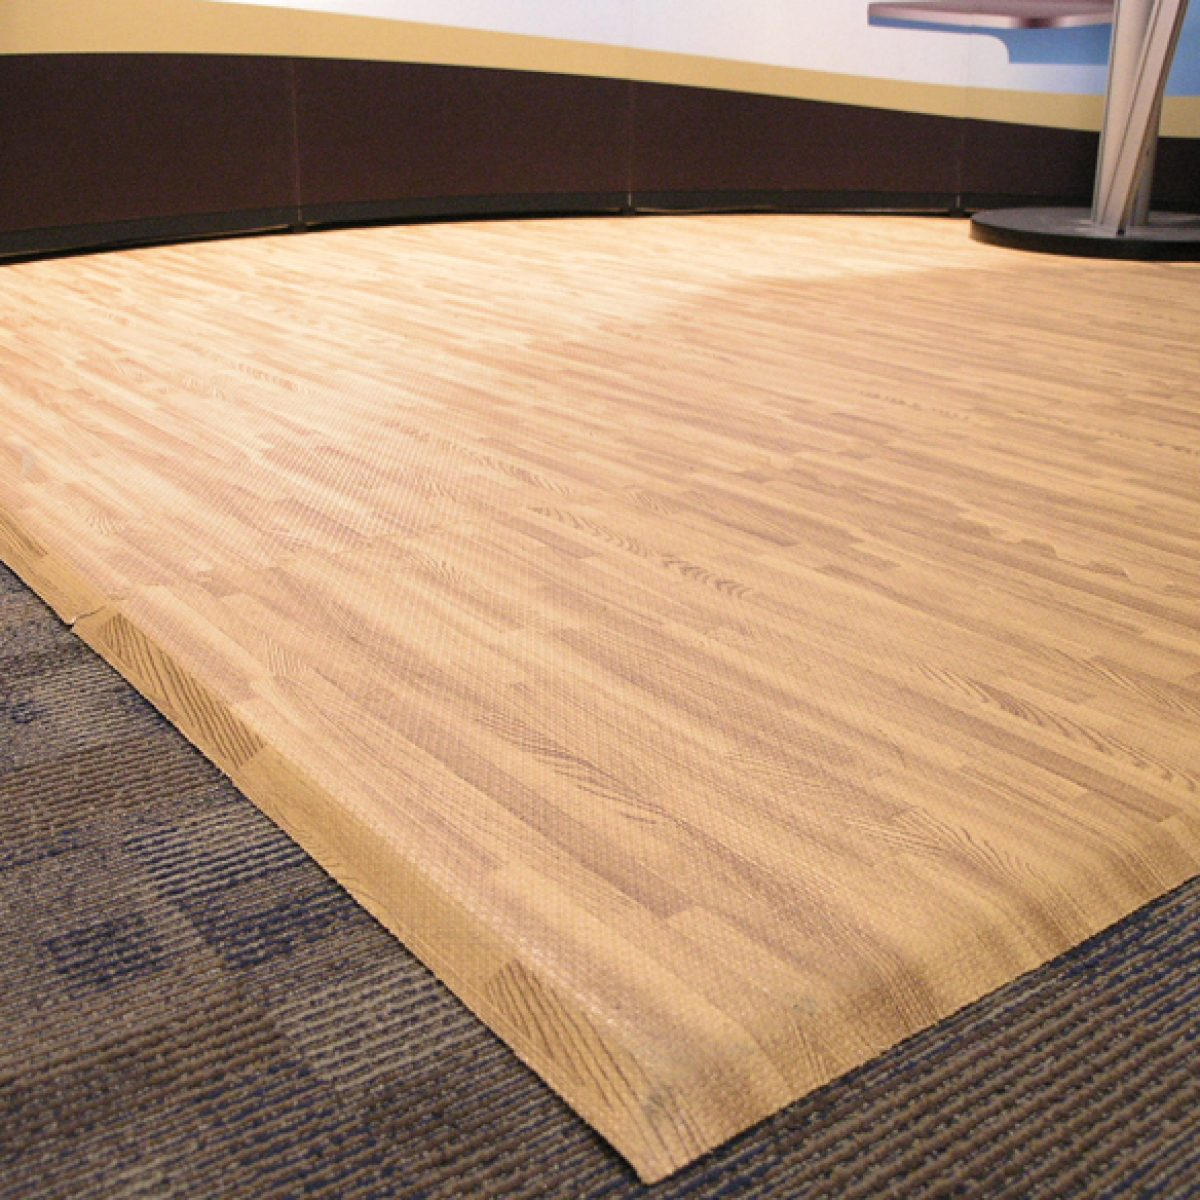 3) Hardwood Comfort Tile